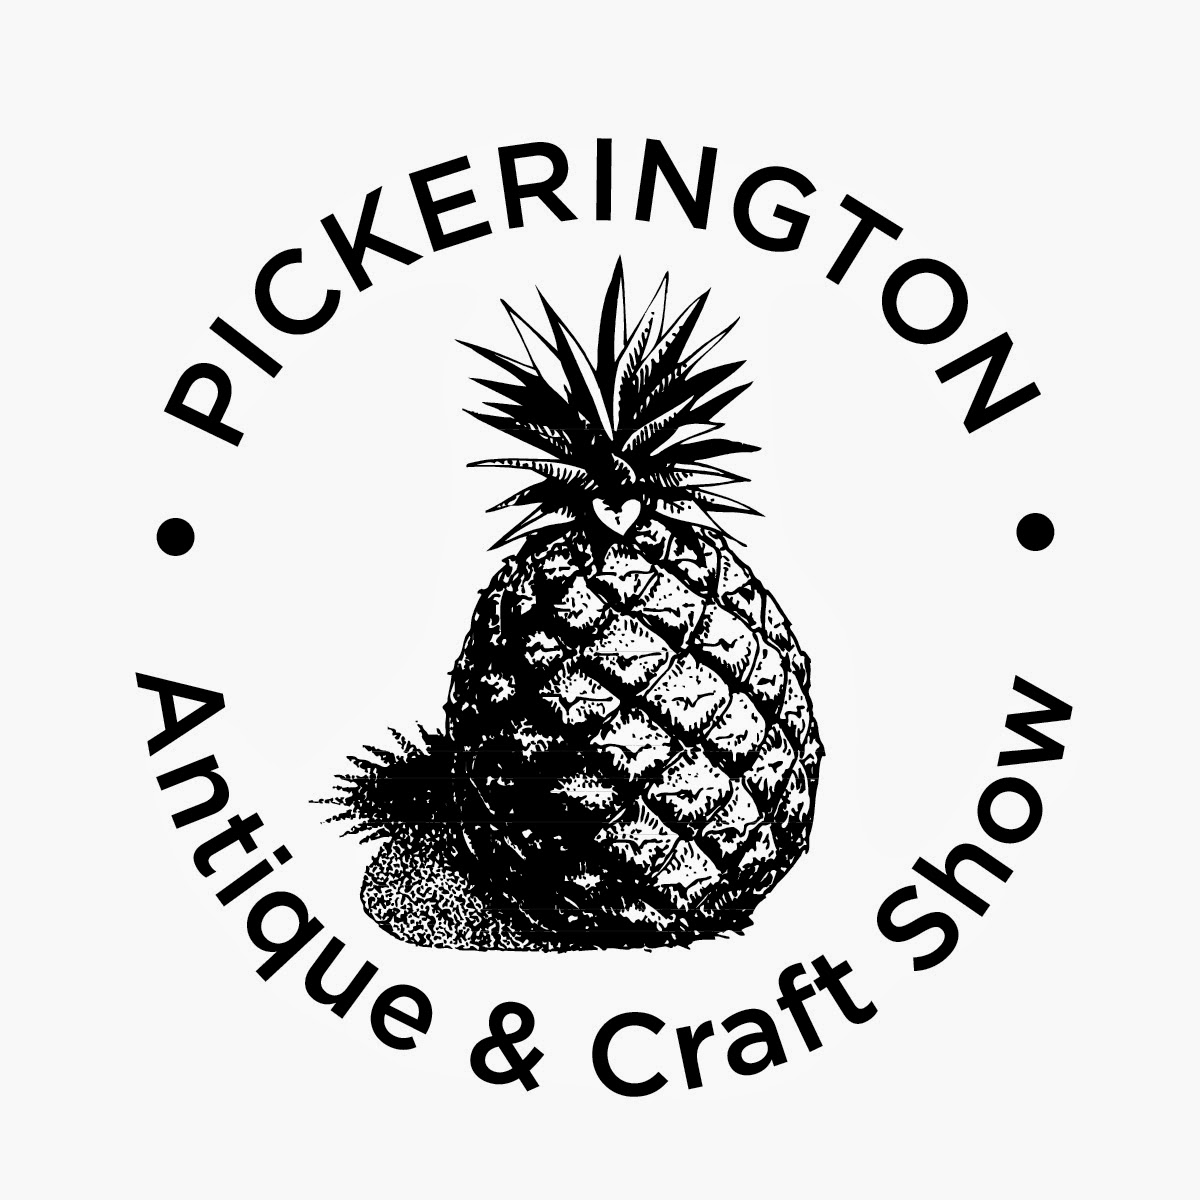 A Pickerington Tradition since 1984